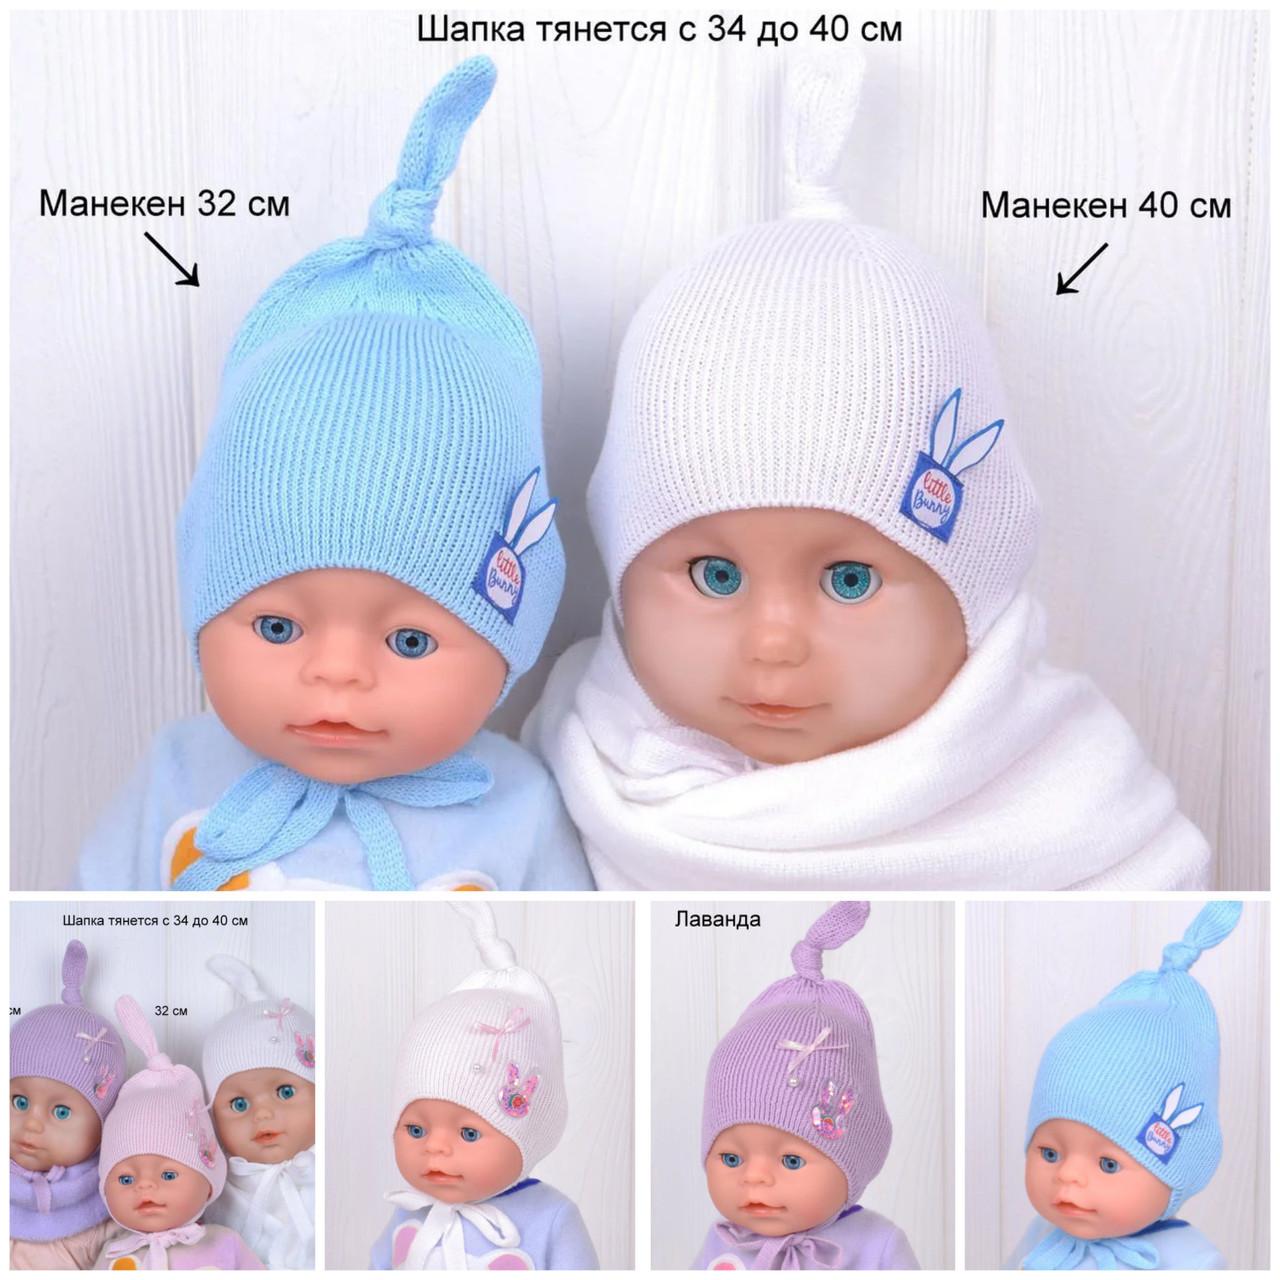 Шапочка для младенца девочки, Светло розовый, 40